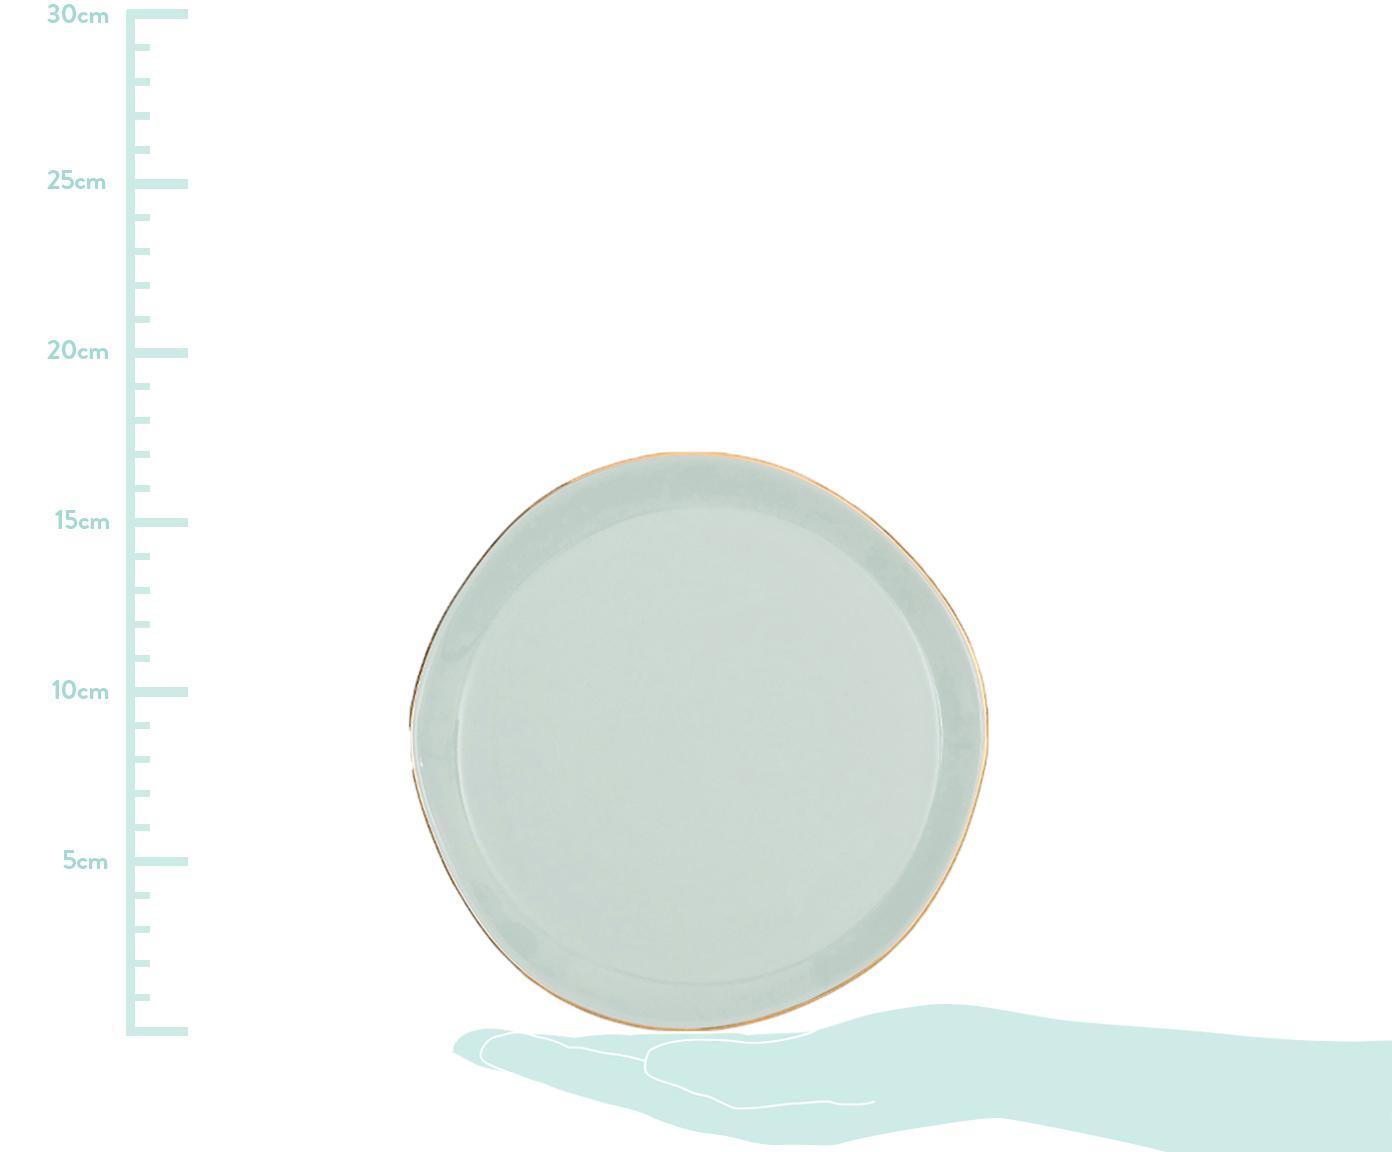 Ontbijtbord Good Morning, Porselein, Mint, goudkleurig, Ø 17 cm